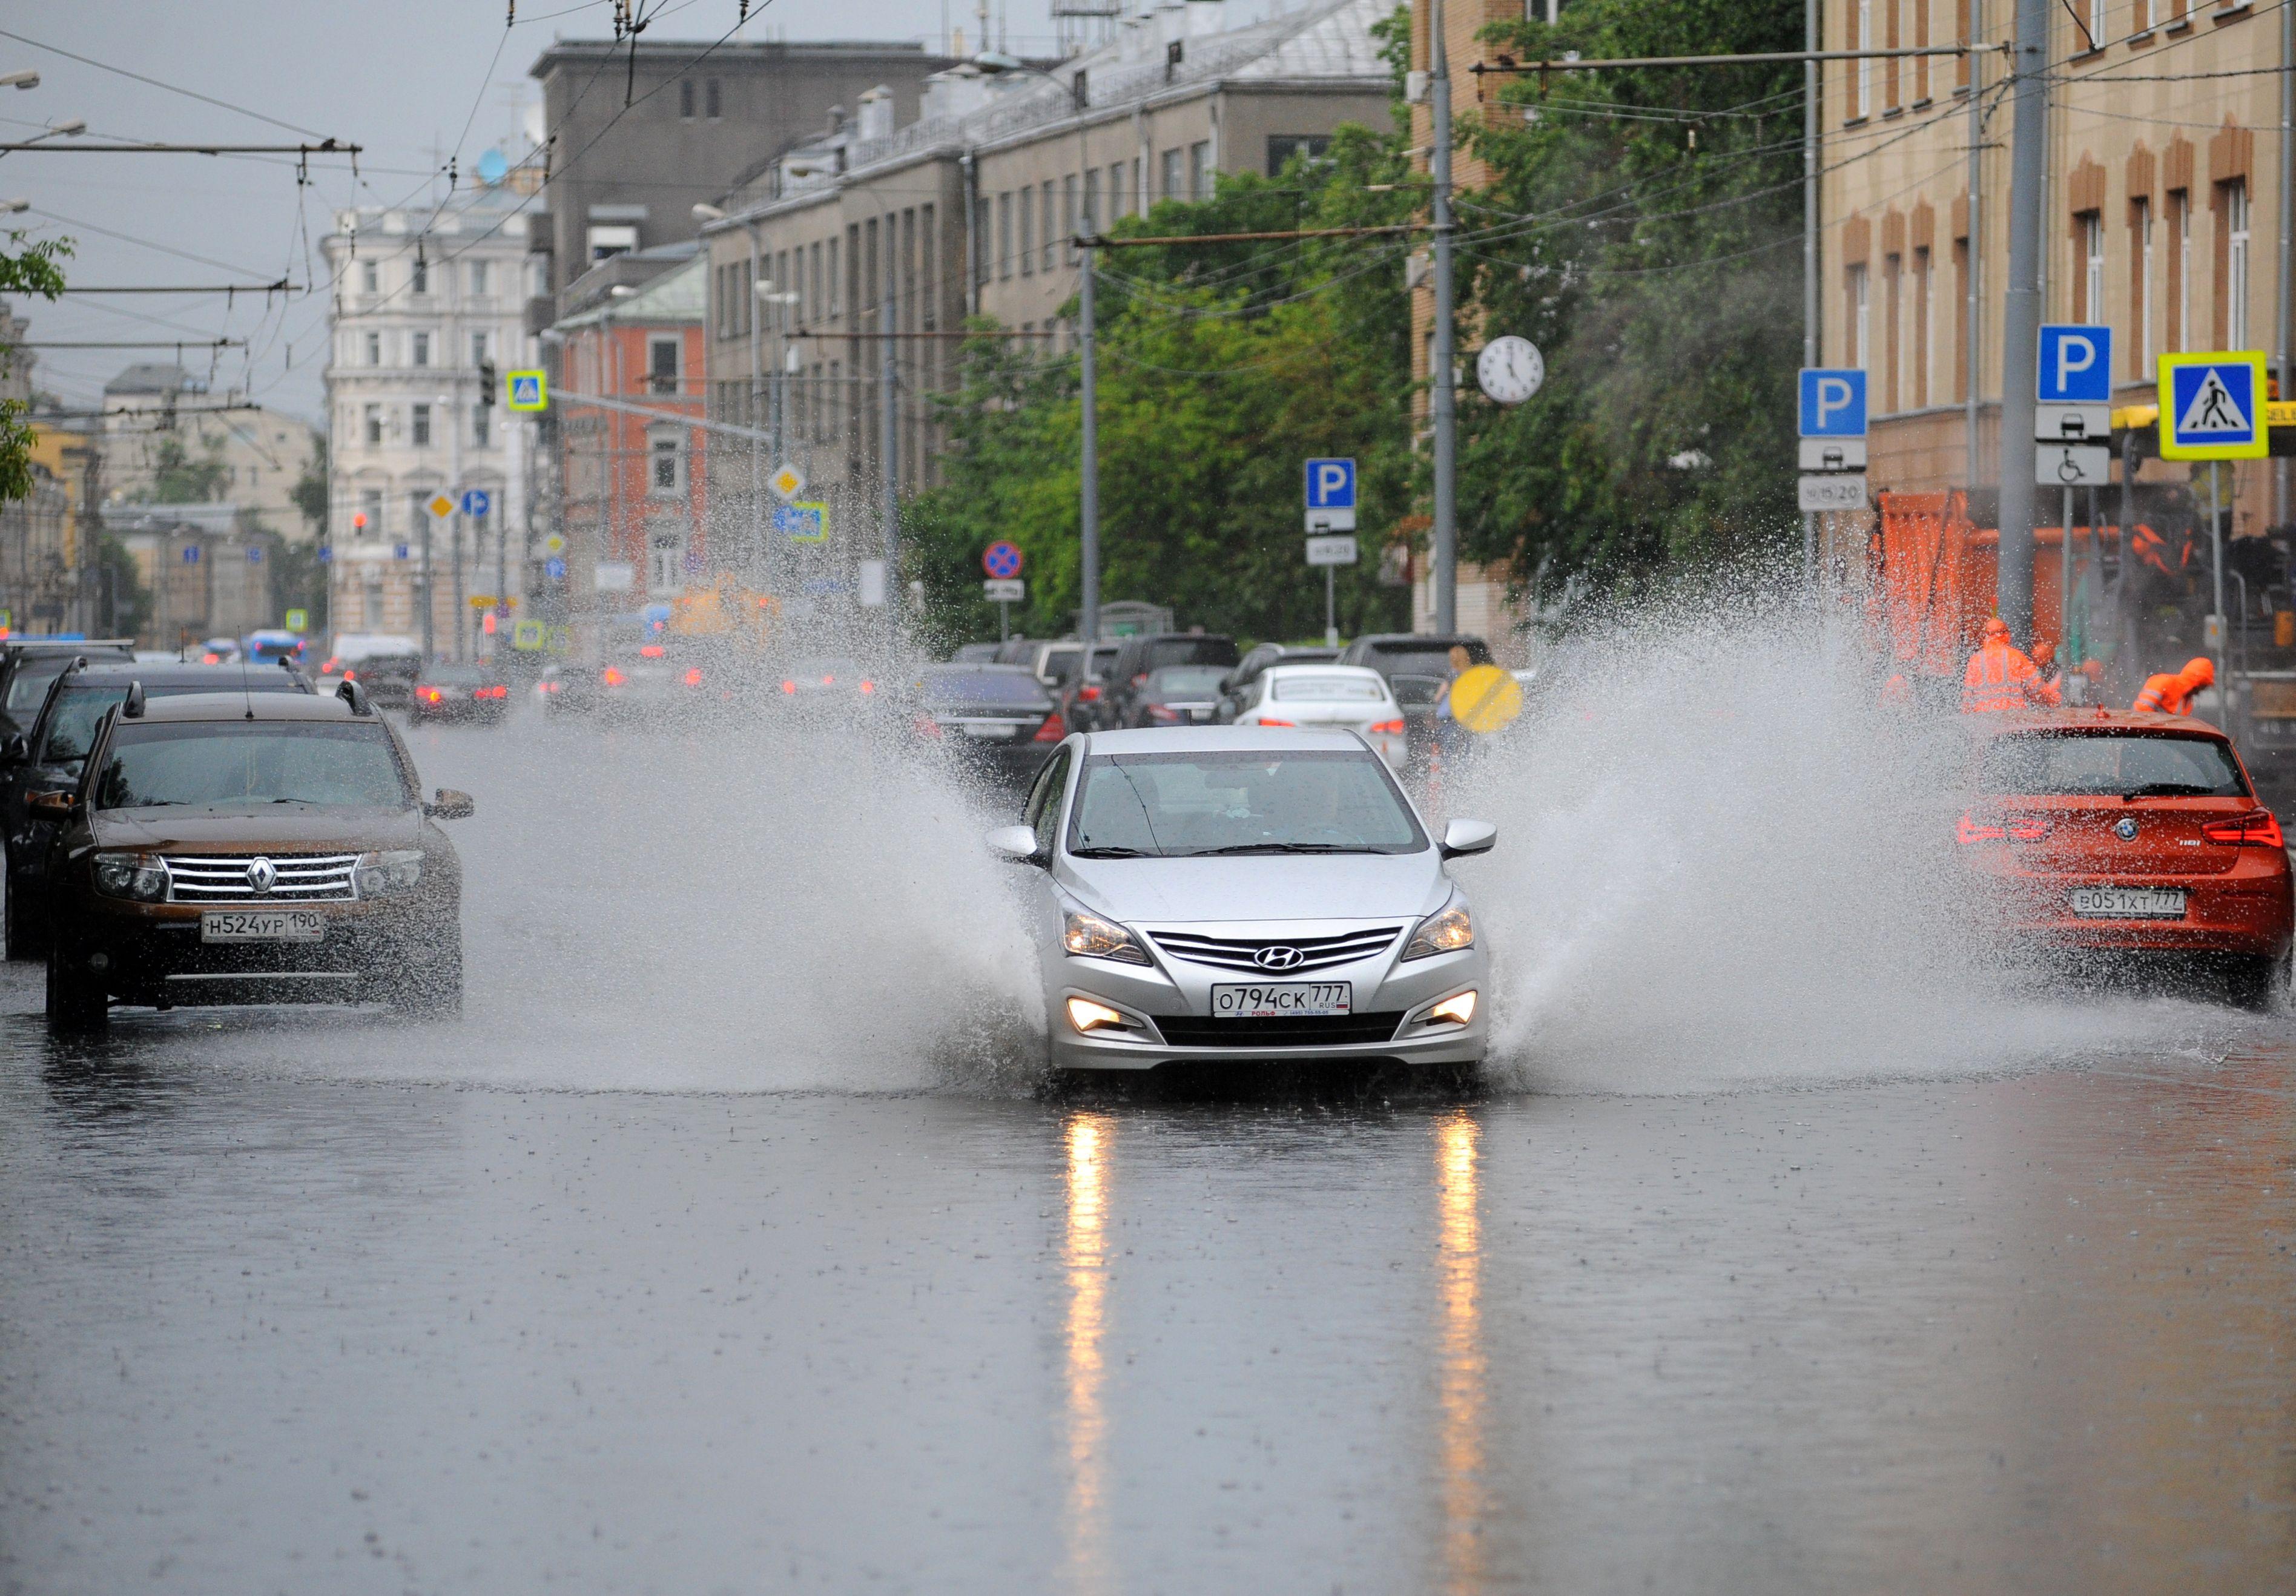 Вечером в четверг Москву ждут пробки и ДТП